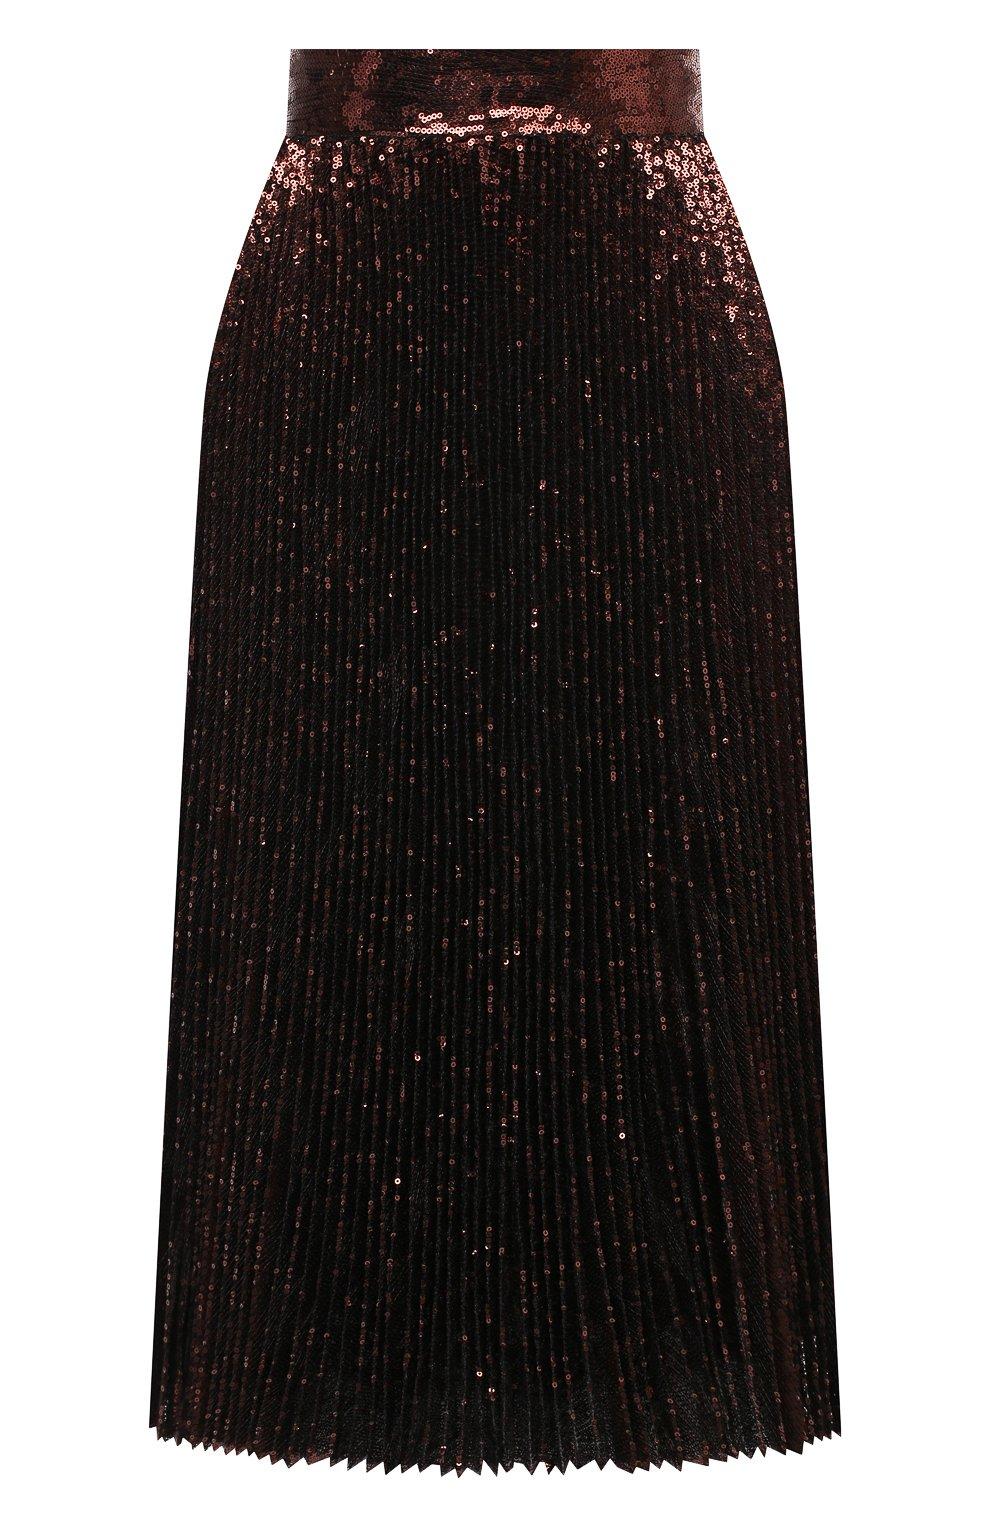 Женская юбка DOLCE & GABBANA бронзового цвета, арт. F4BYGT/FLMK4 | Фото 1